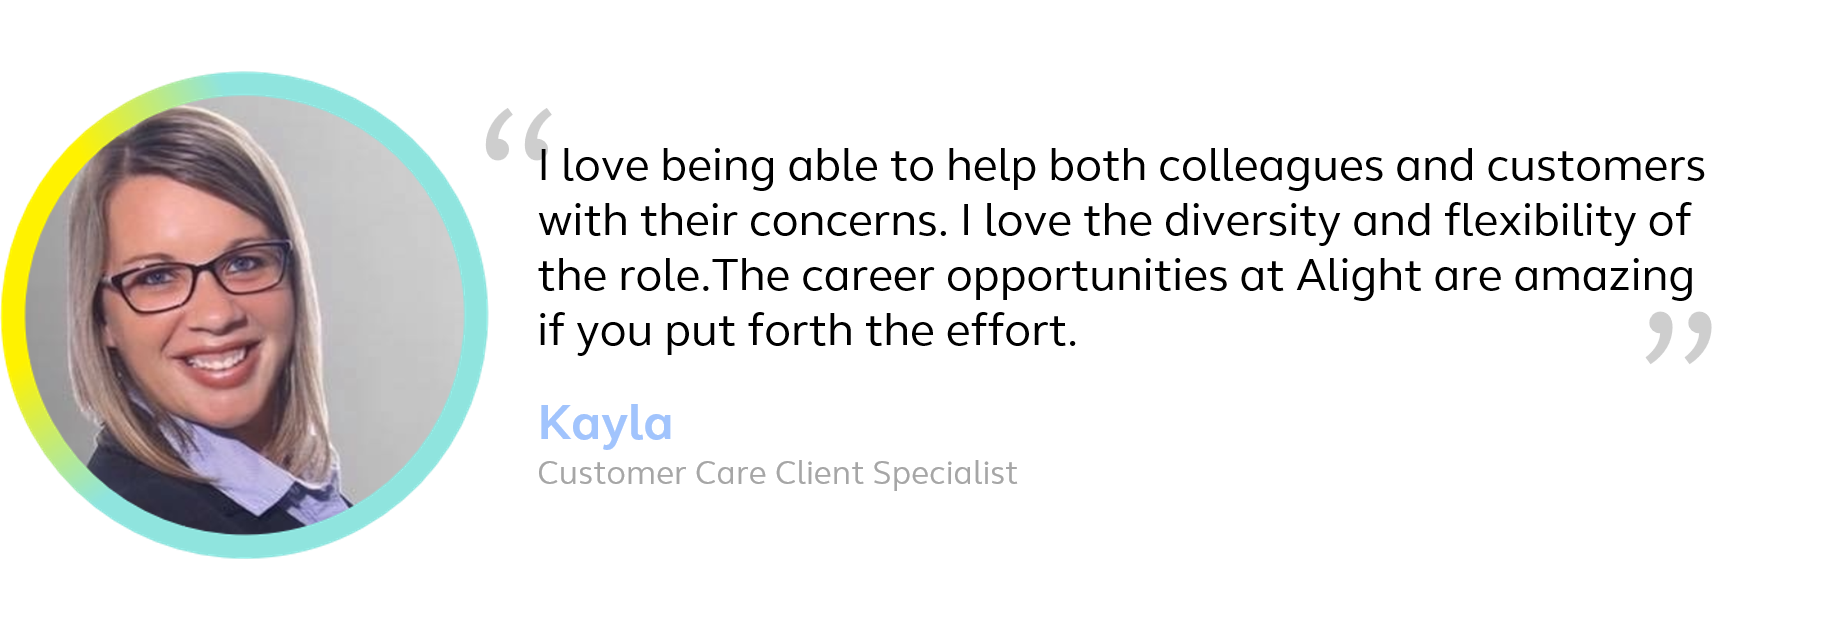 Customer Care colleague testimonial